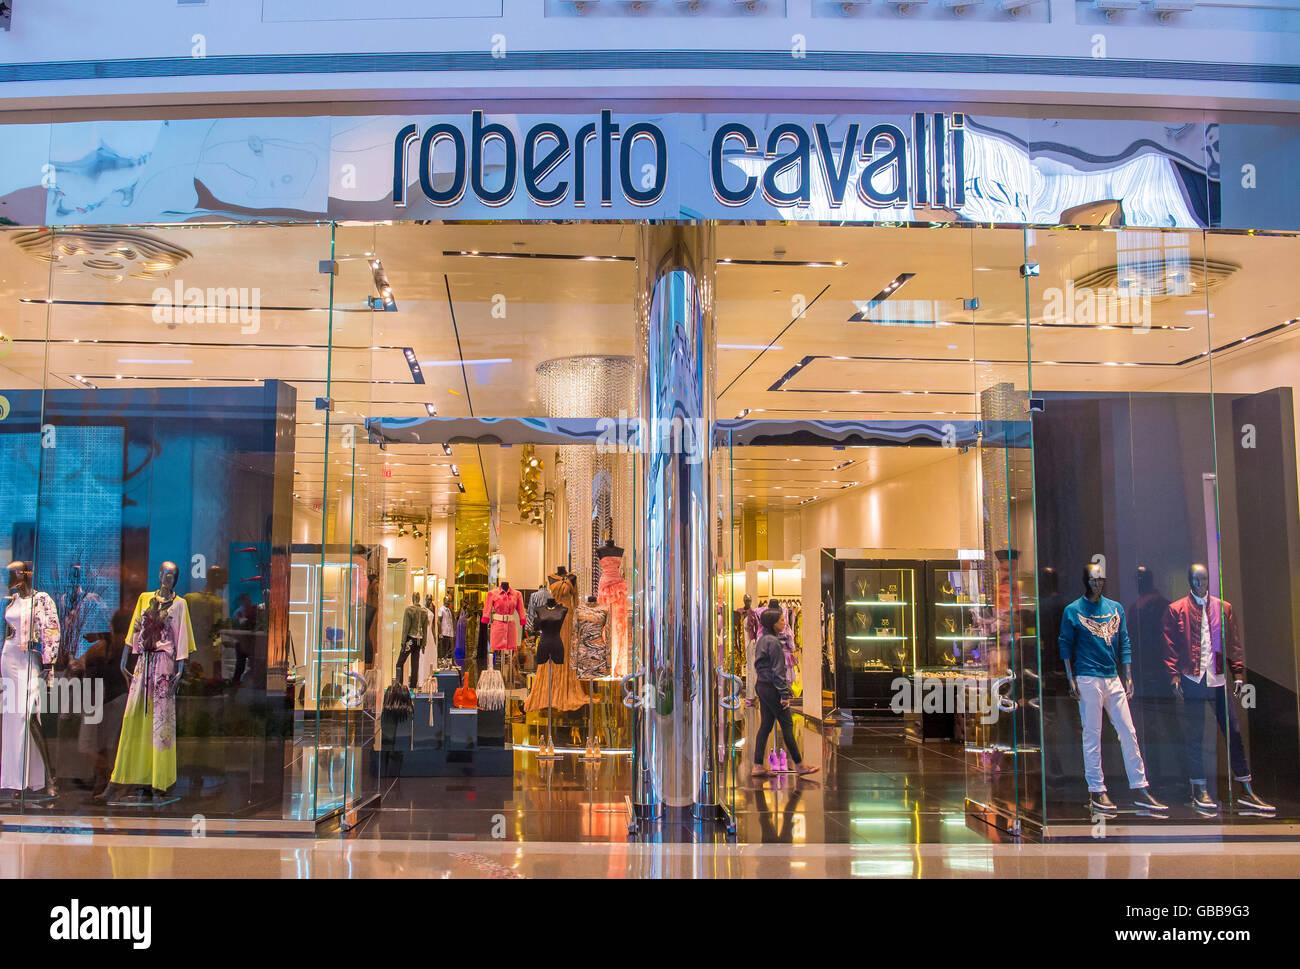 Exterior of a Roberto Cavalli store in Las Vegas strip Stock Photo